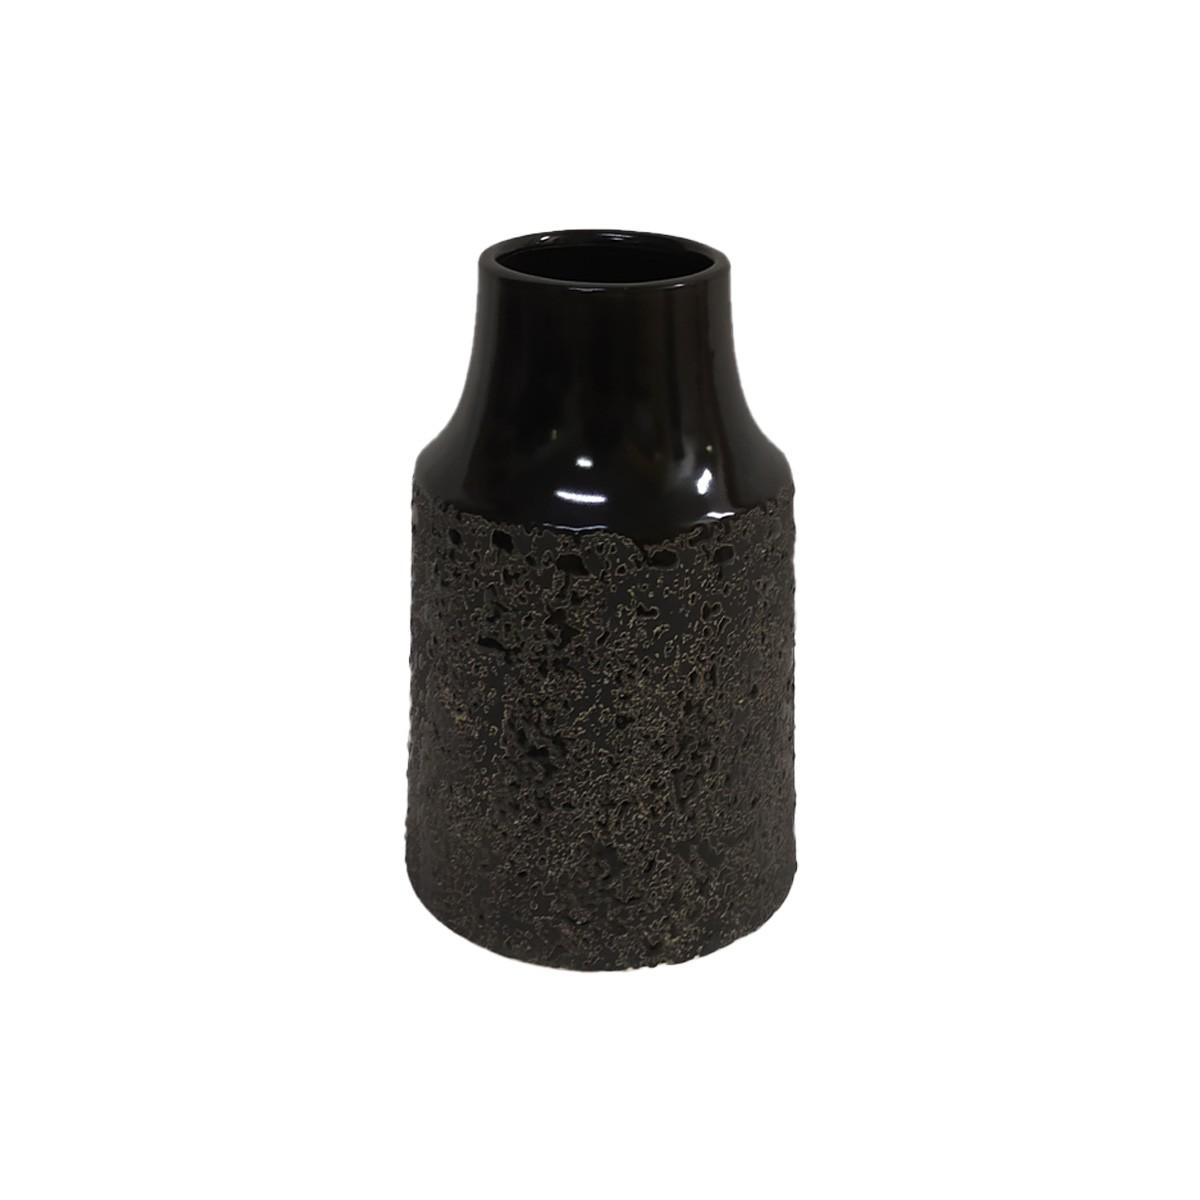 Vaso em Cerâmica Preta texturizada - 21,5 cm